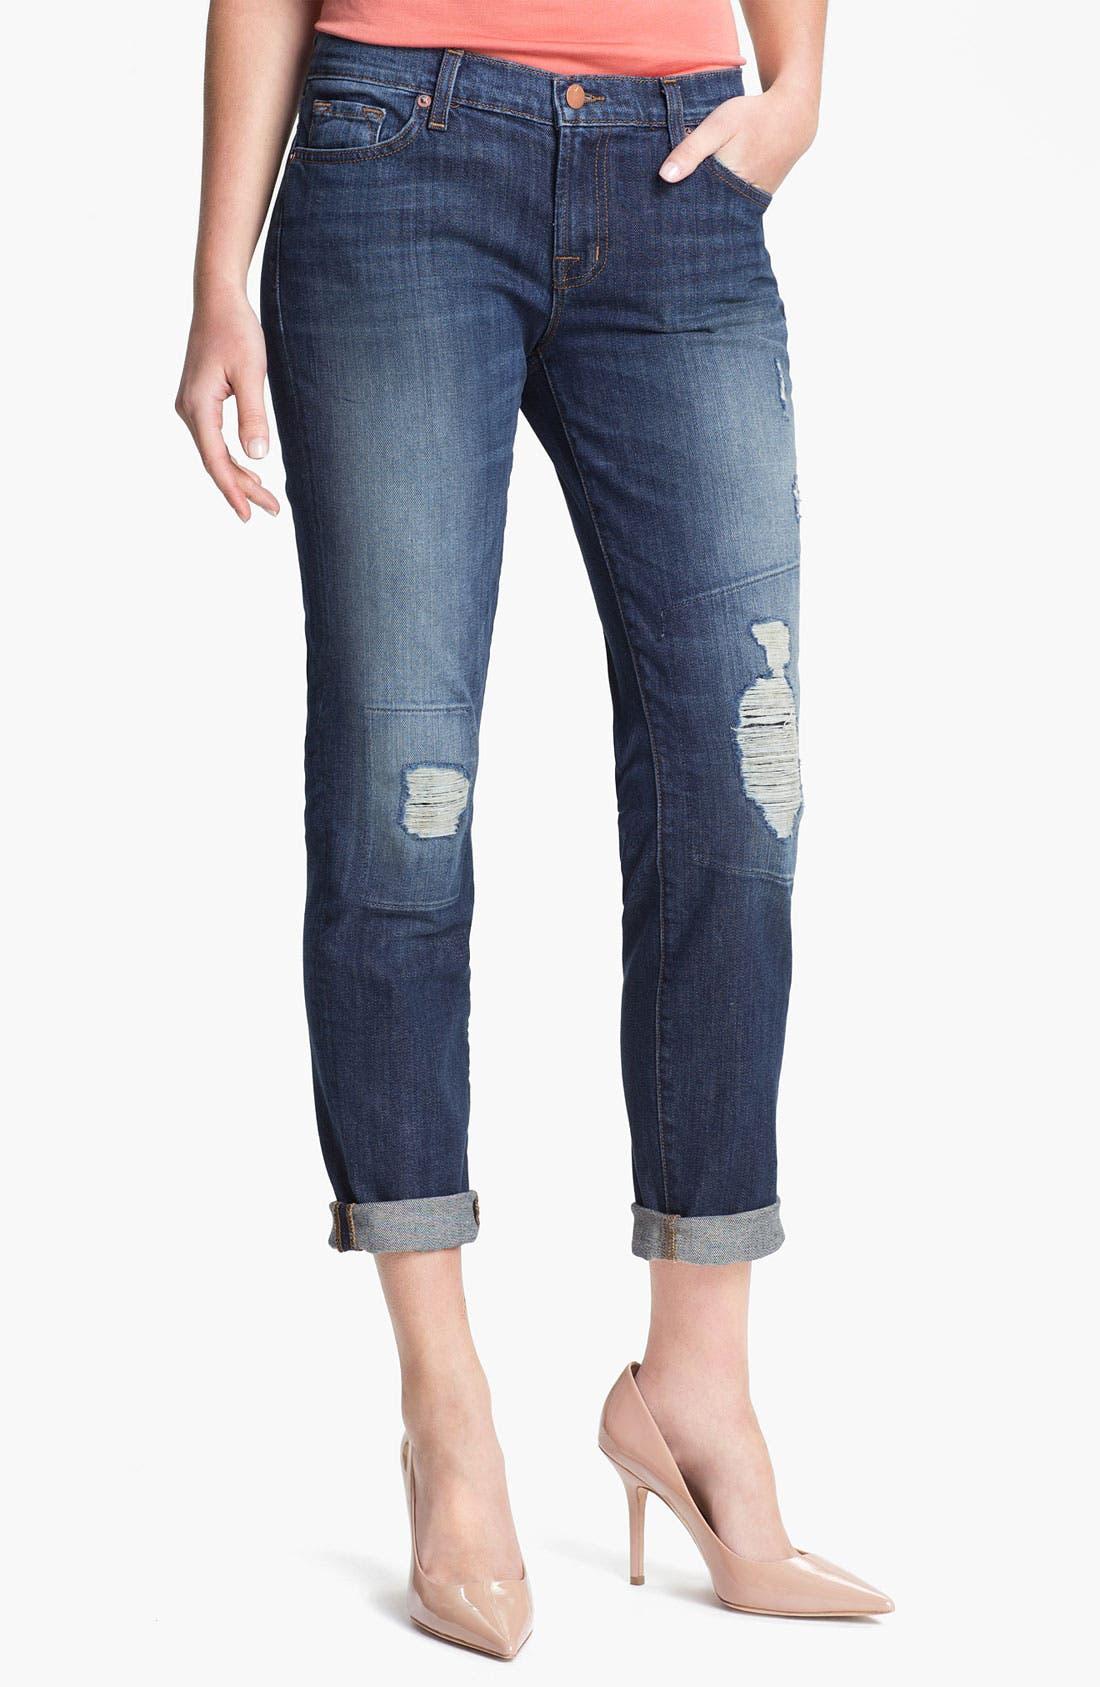 Alternate Image 1 Selected - J Brand 'Midori' Destroyed Boyfriend Jeans (Big Time)